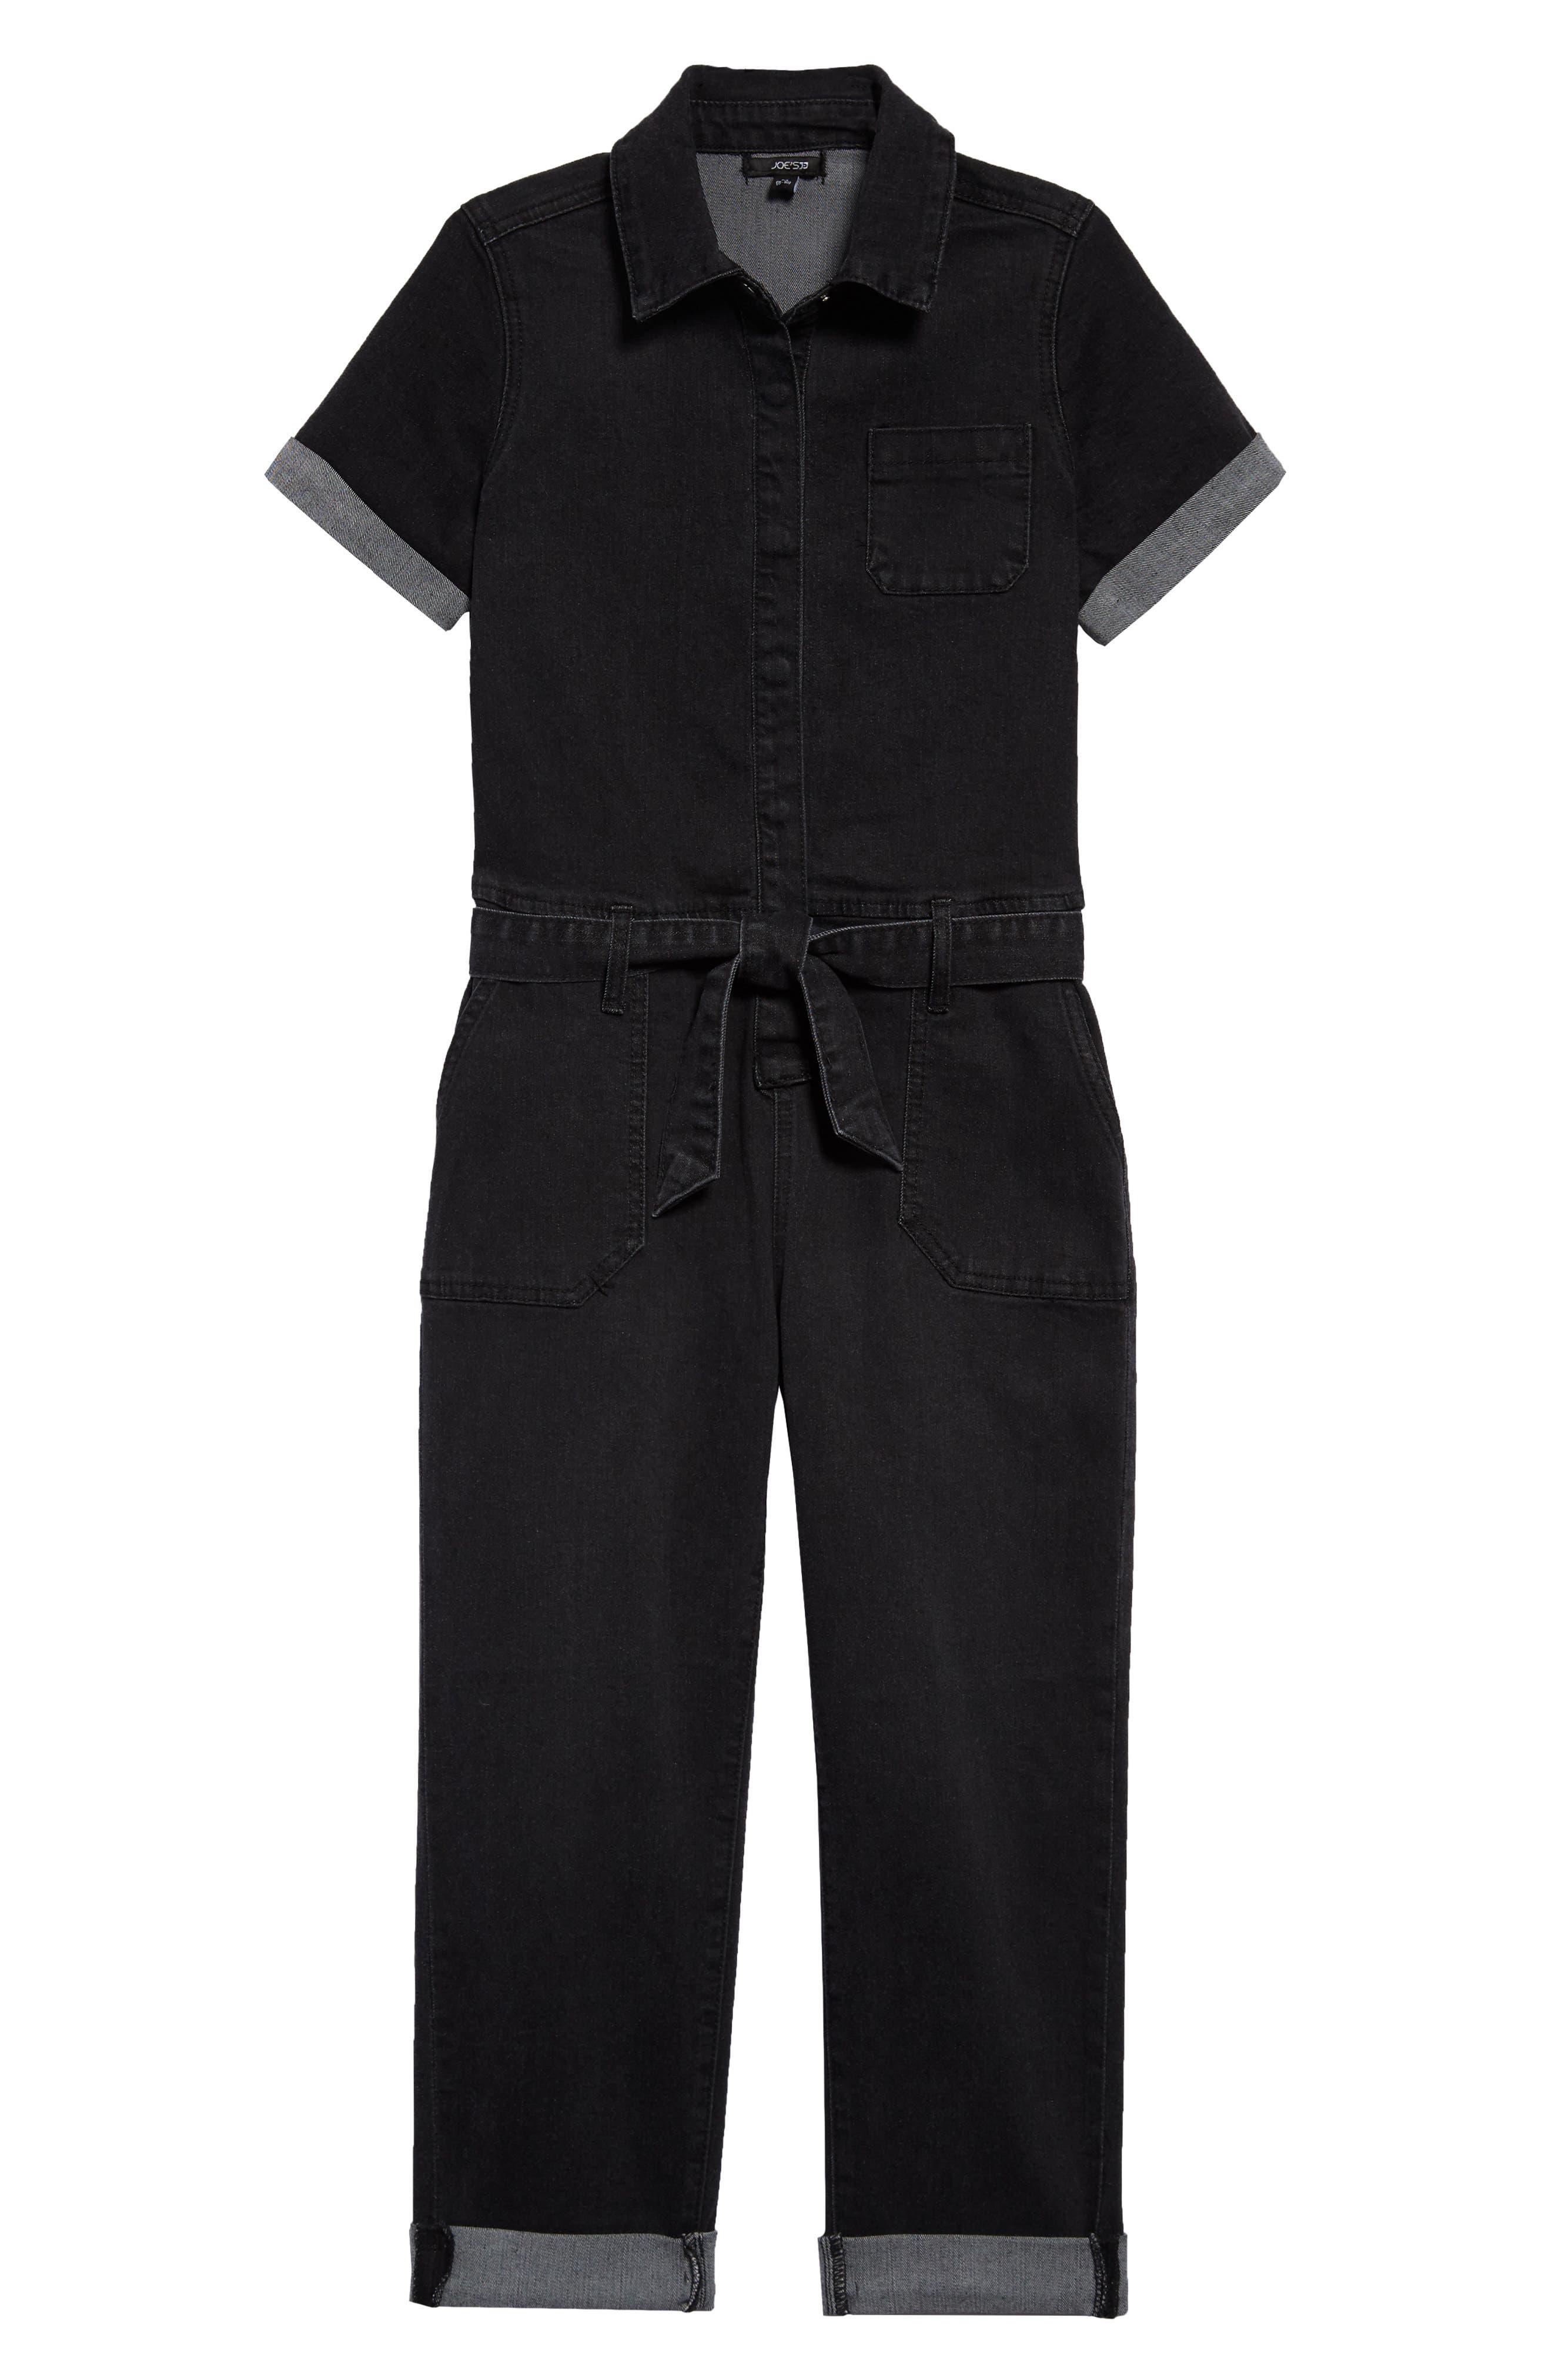 1940s Children's Clothing: Girls, Boys, Baby, Toddler Girls Joes The Mavis Denim Jumpsuit $59.00 AT vintagedancer.com